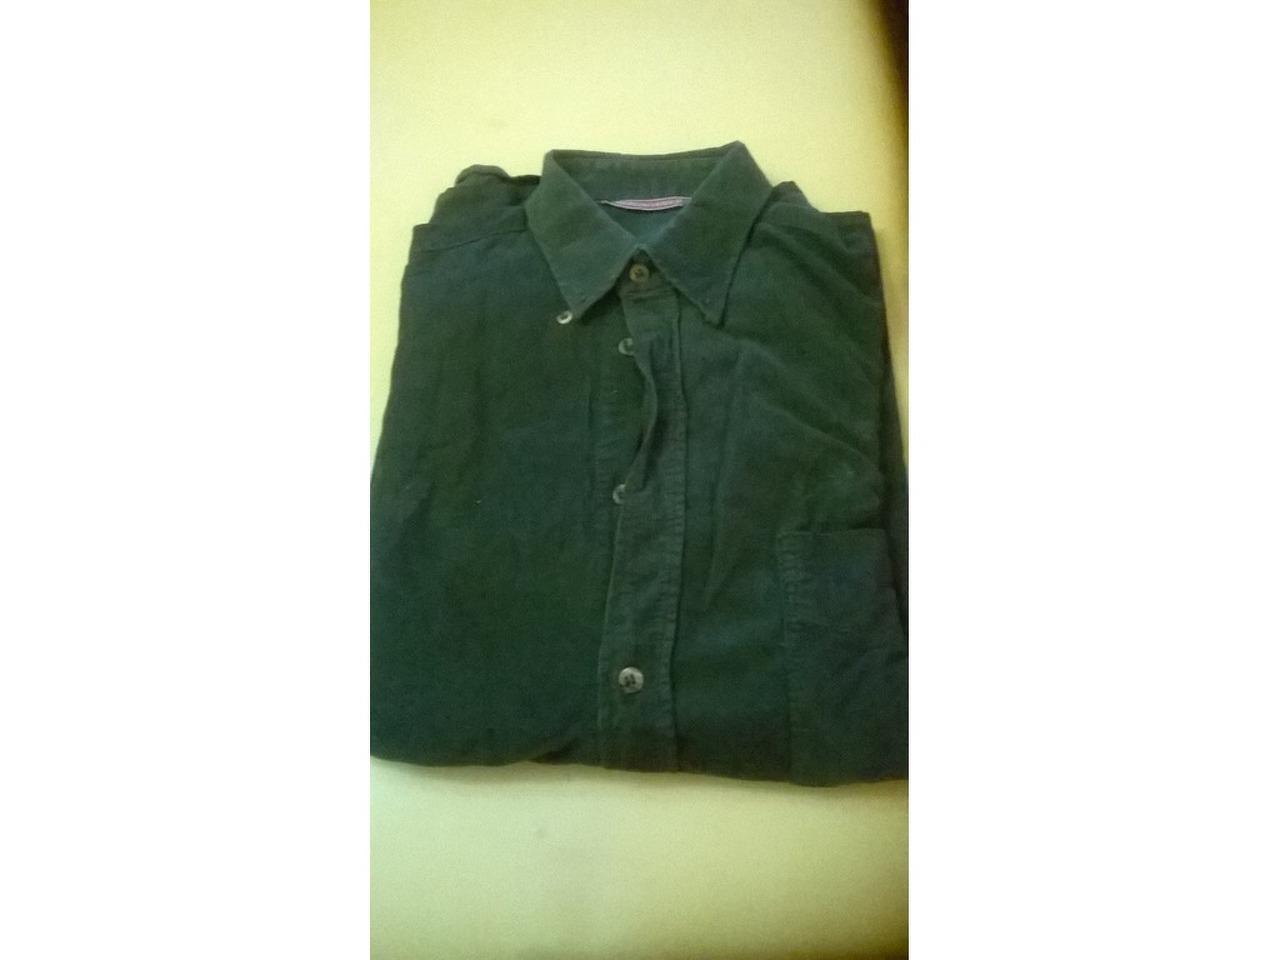 Camisas Barred's, G.Coast, C.Jeans, Cayo Largo, LOGG, N.Corrêa, etc - 7/8